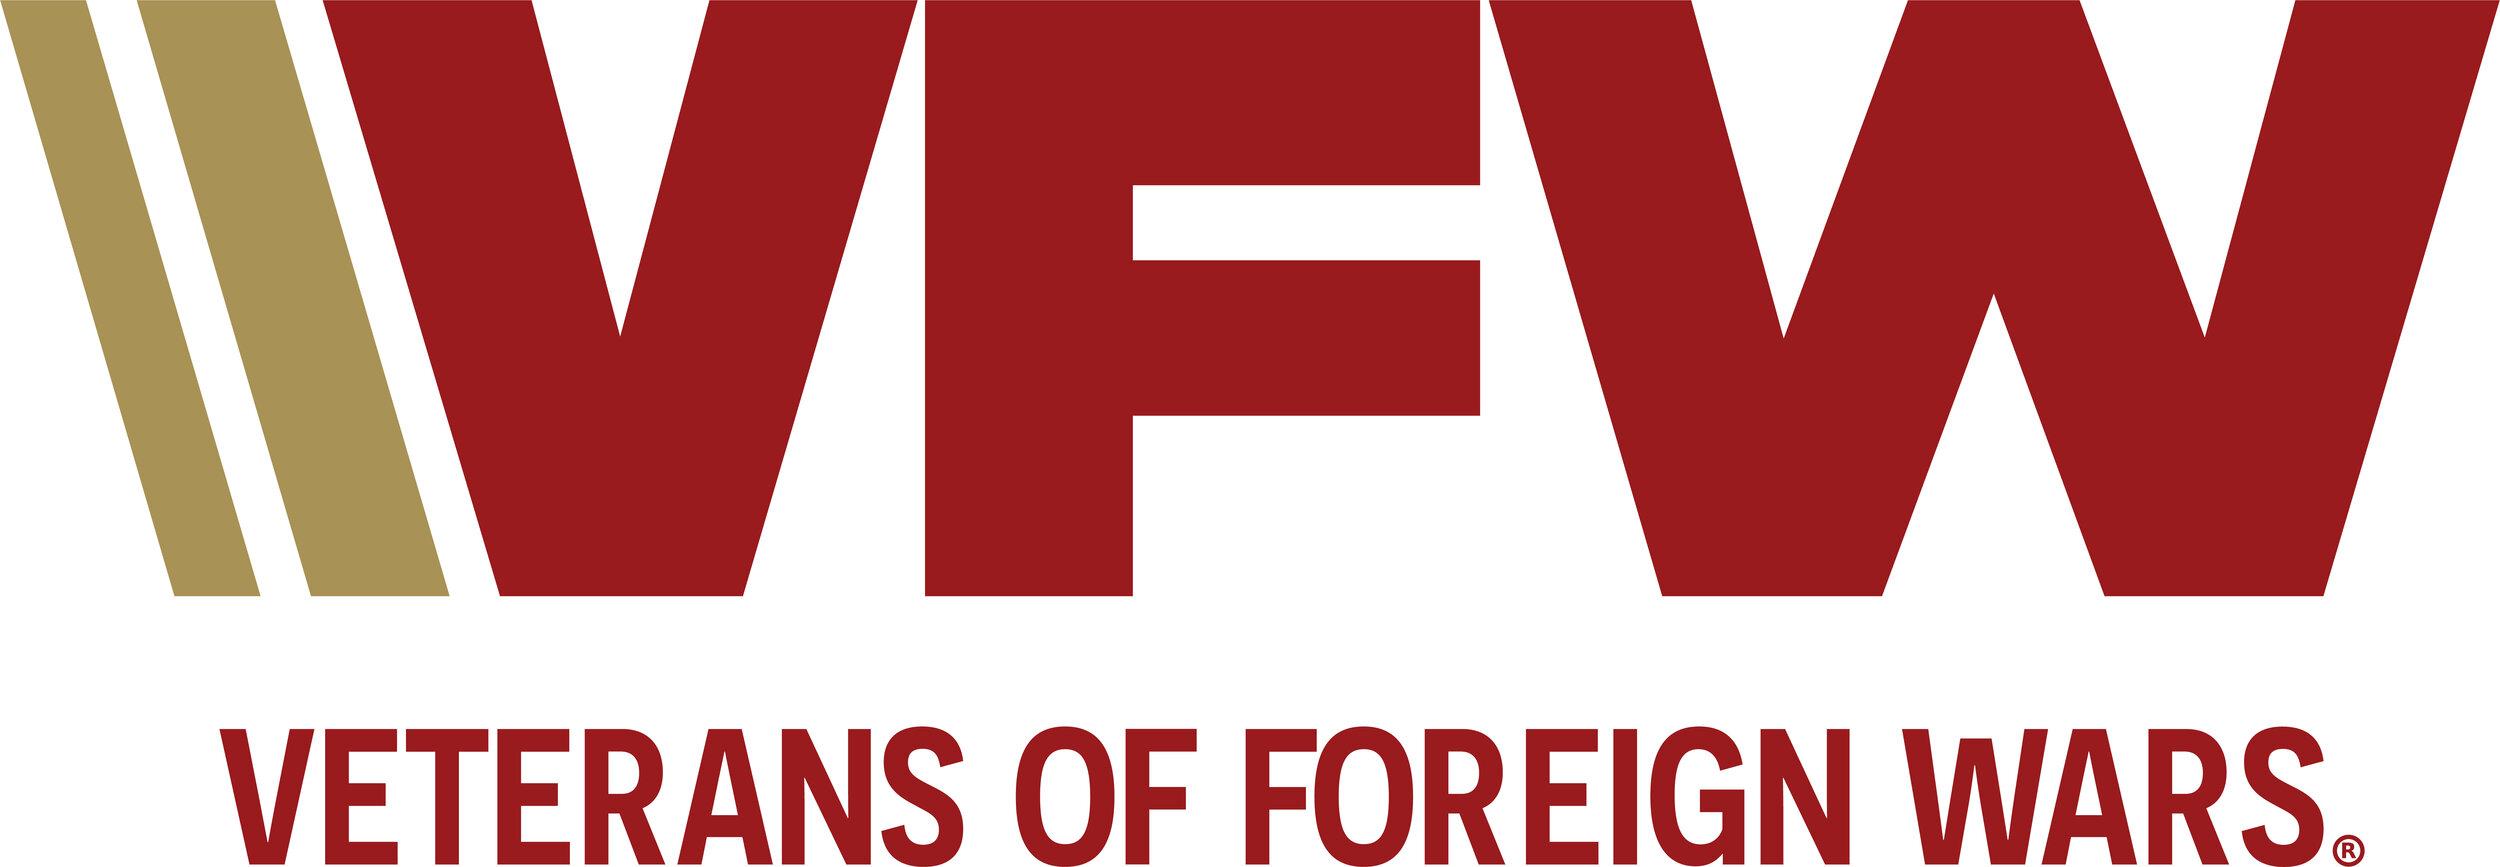 VFW-Logo-CMYK-large.jpg